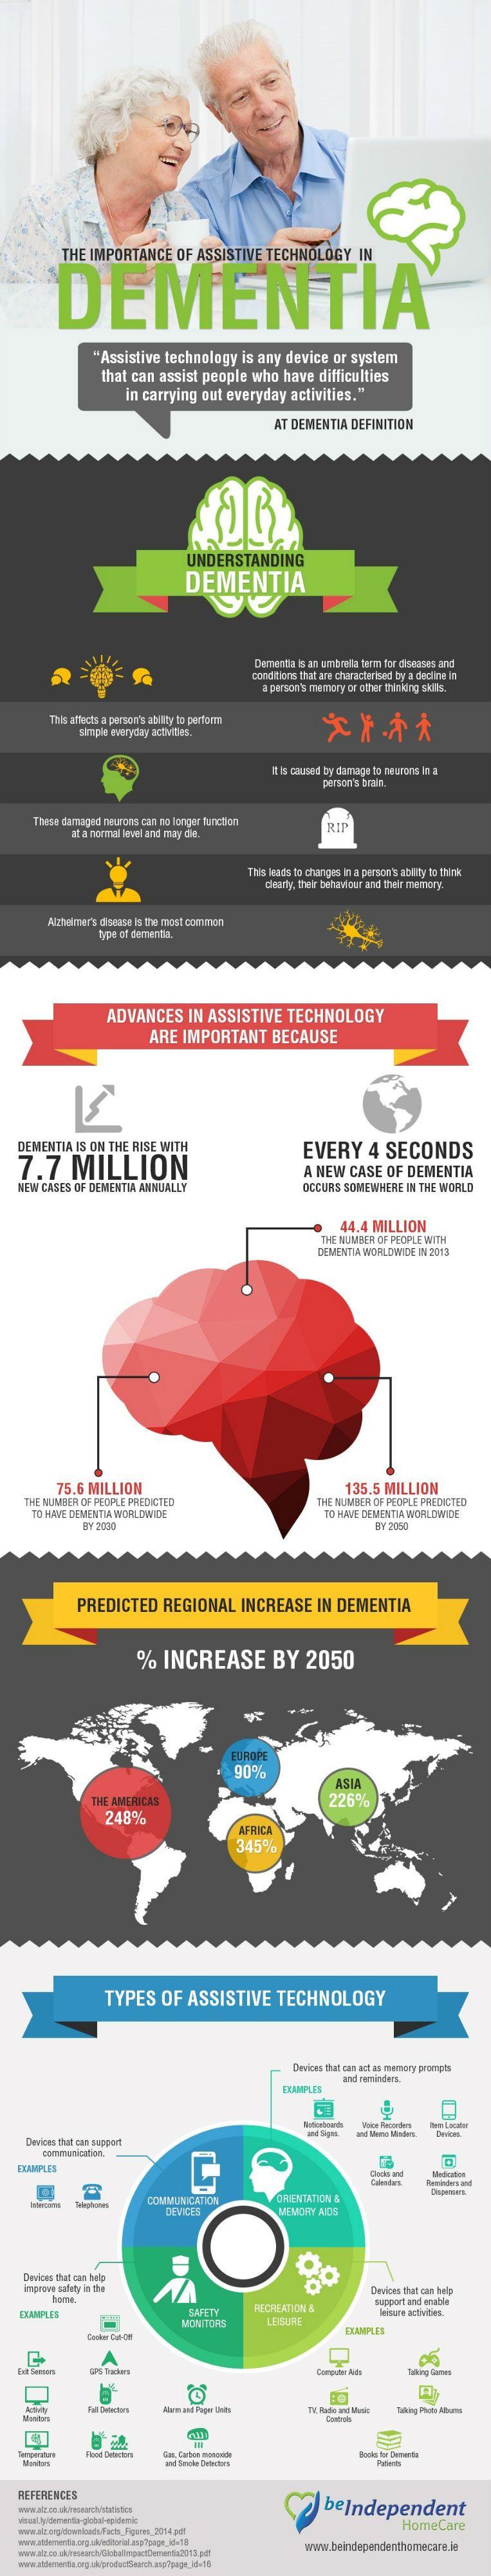 Dementia infographic. text version below.